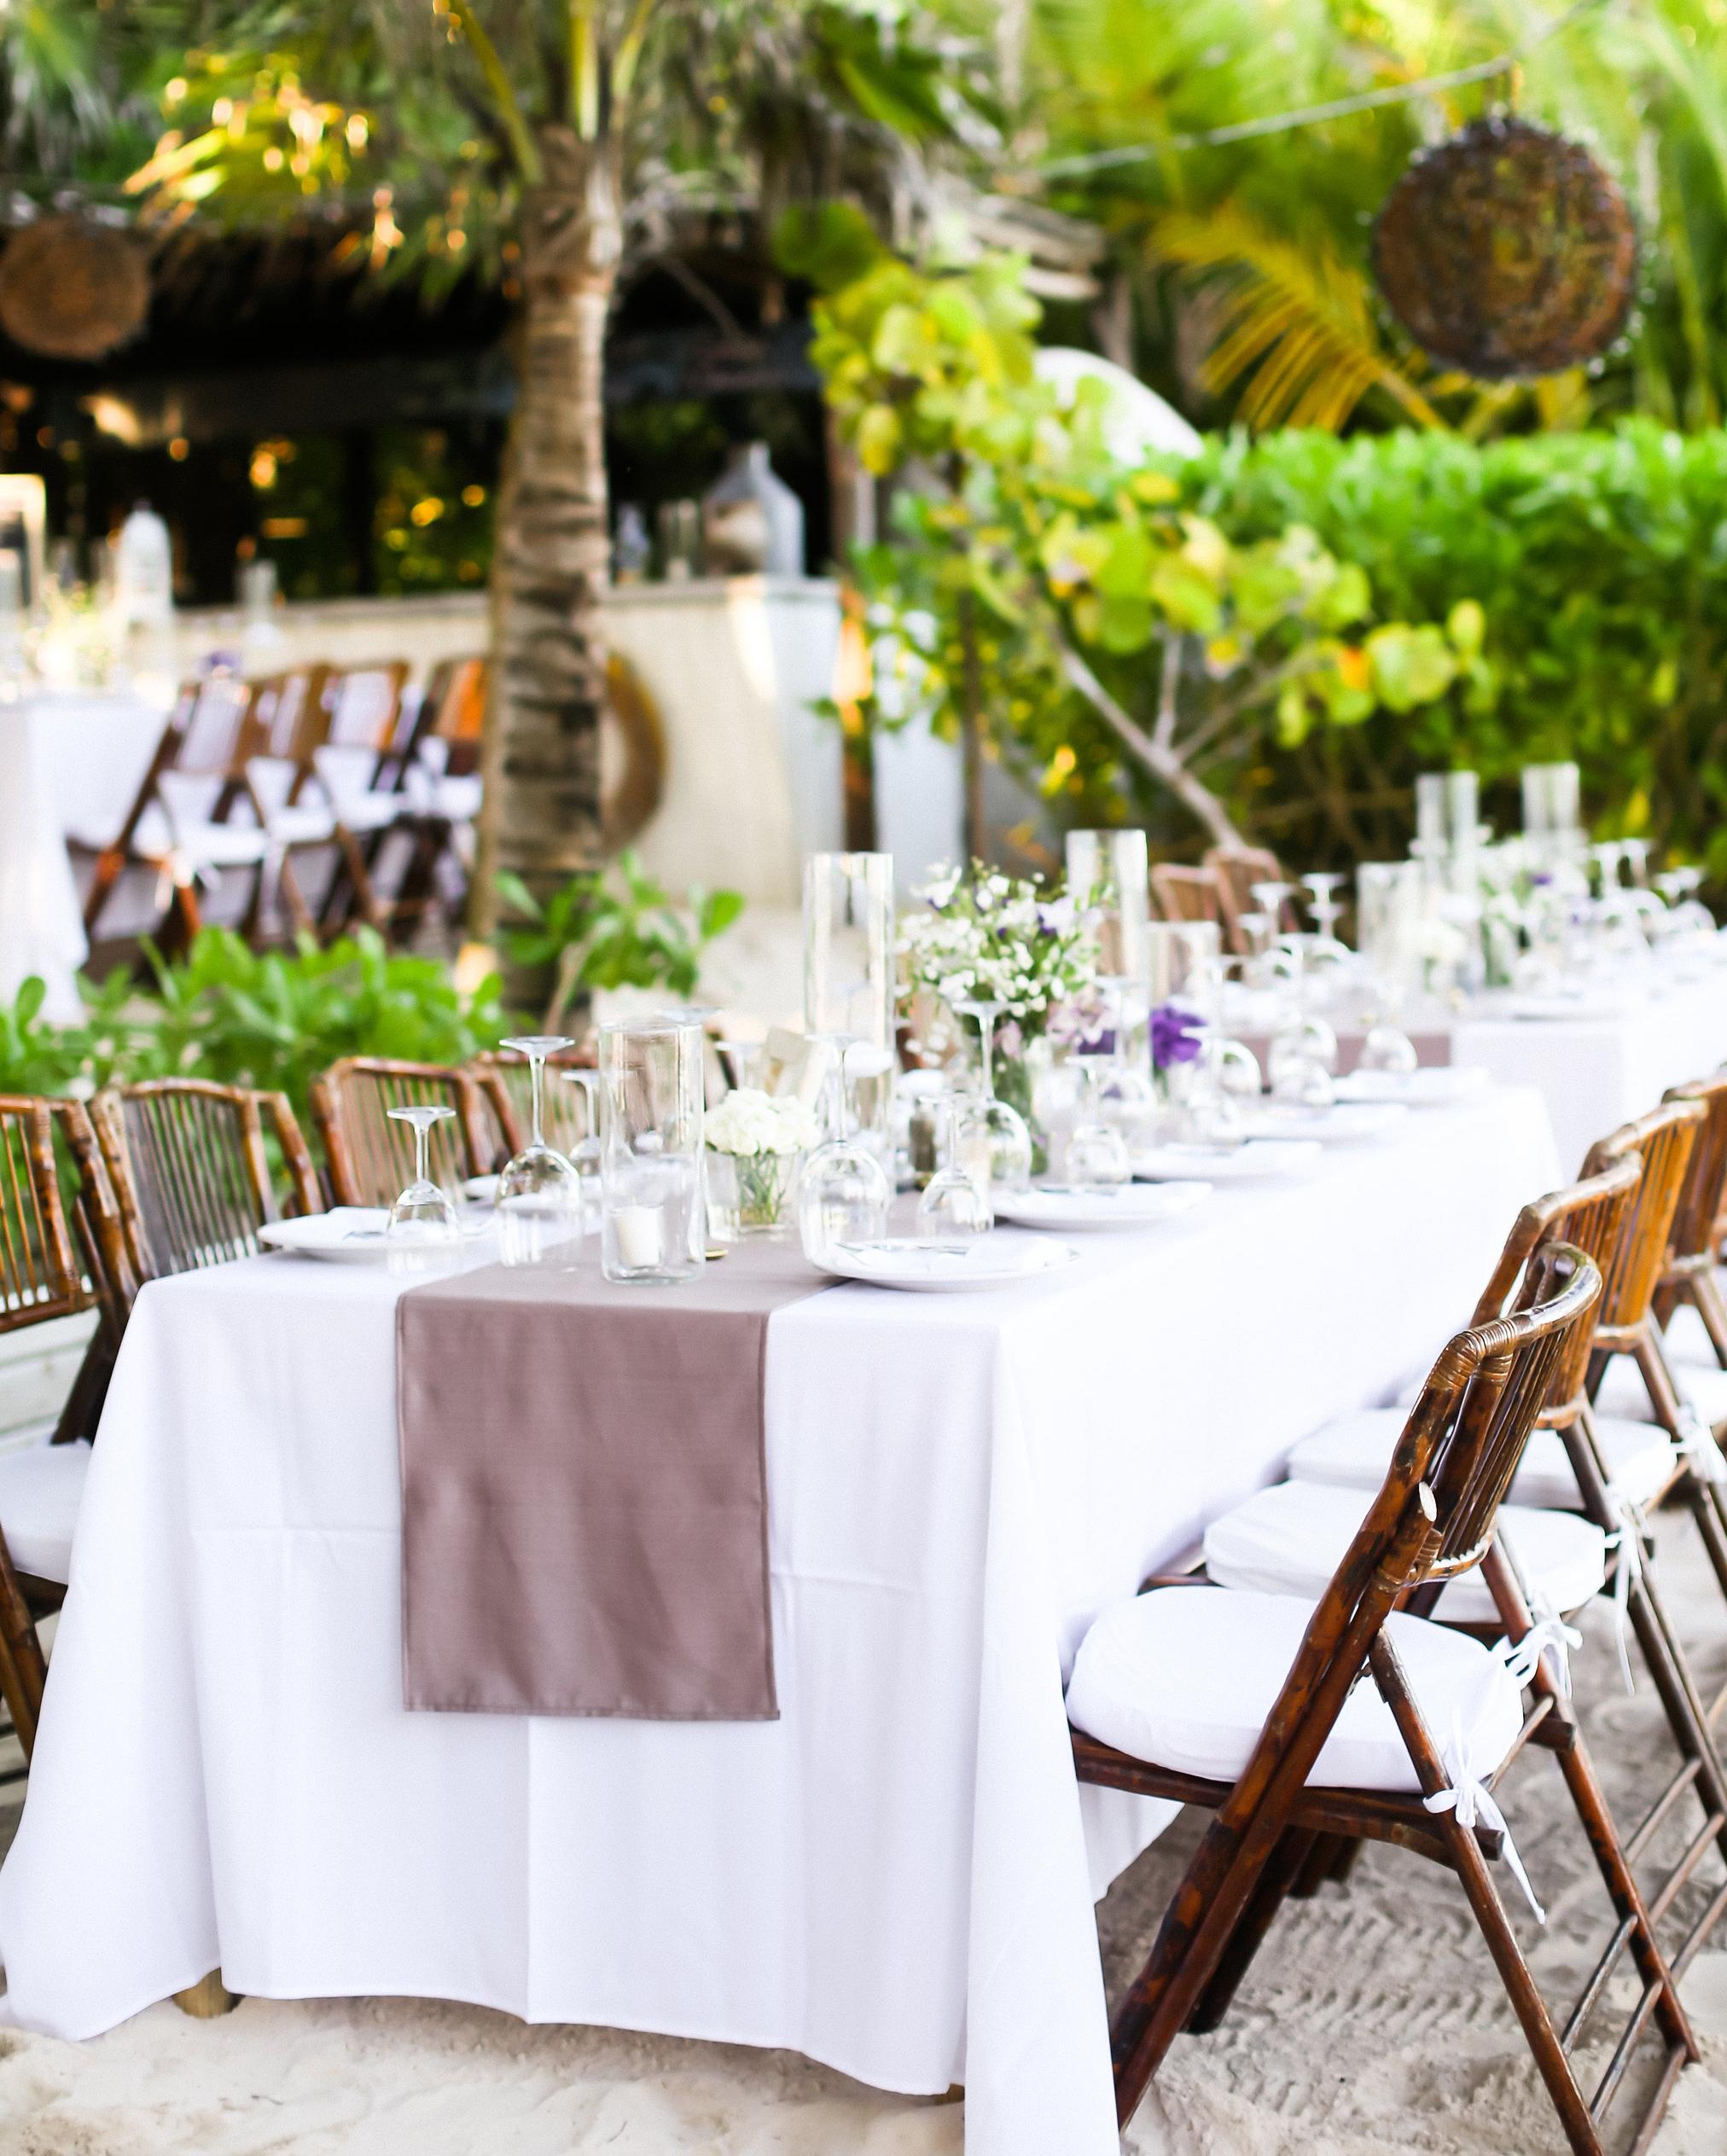 olivia-keith-wedding-reception-67-s112304-0815.jpg